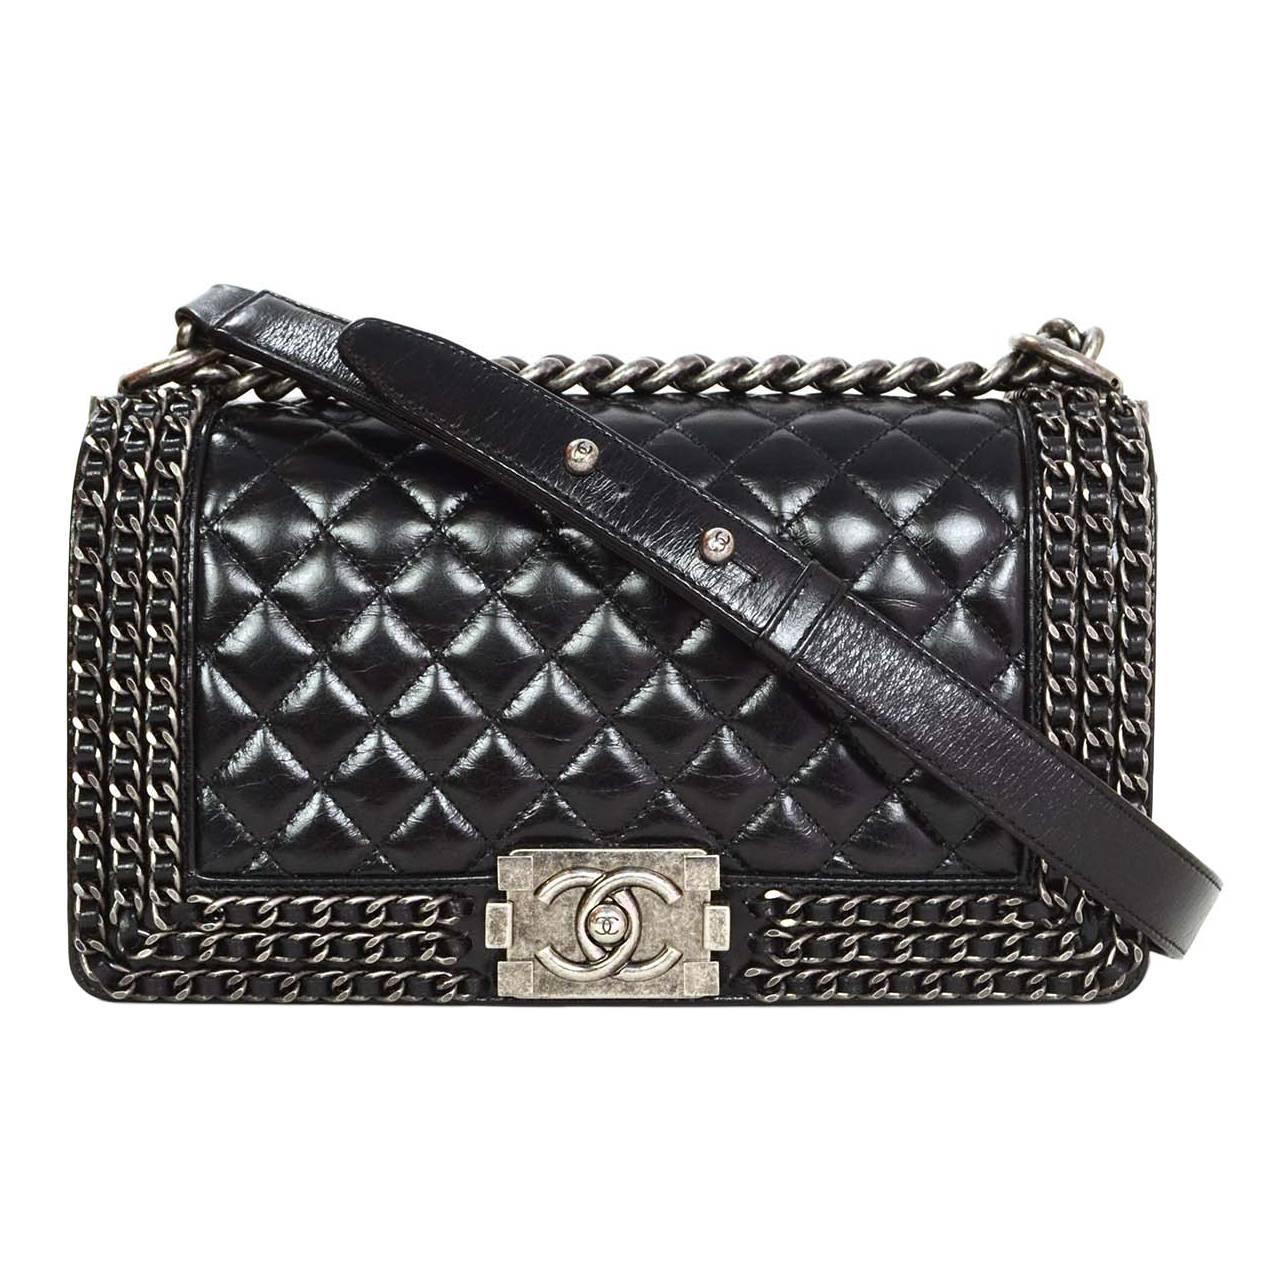 Chanel 15 Black Distressed Leather Chain Around Medium Boy Bag Shw At 1stdibs